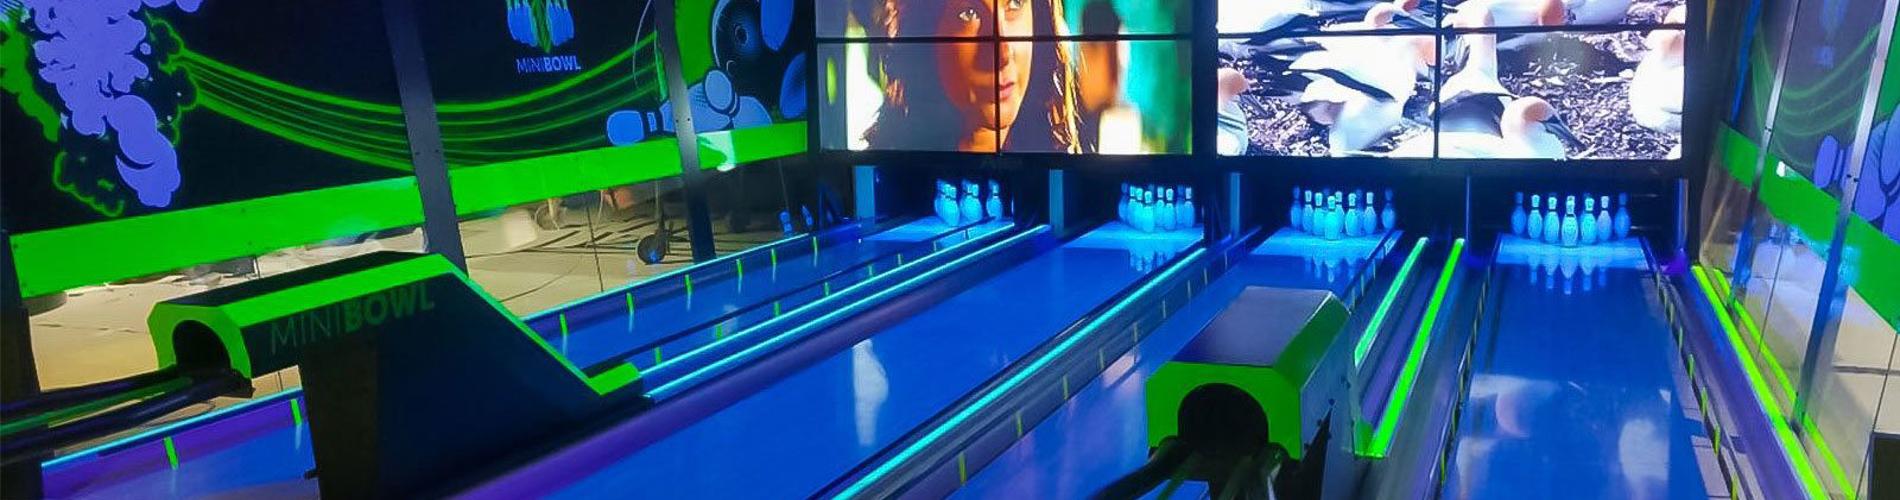 Buffalo Battleground: Mini-Bowling in Buffalo NY